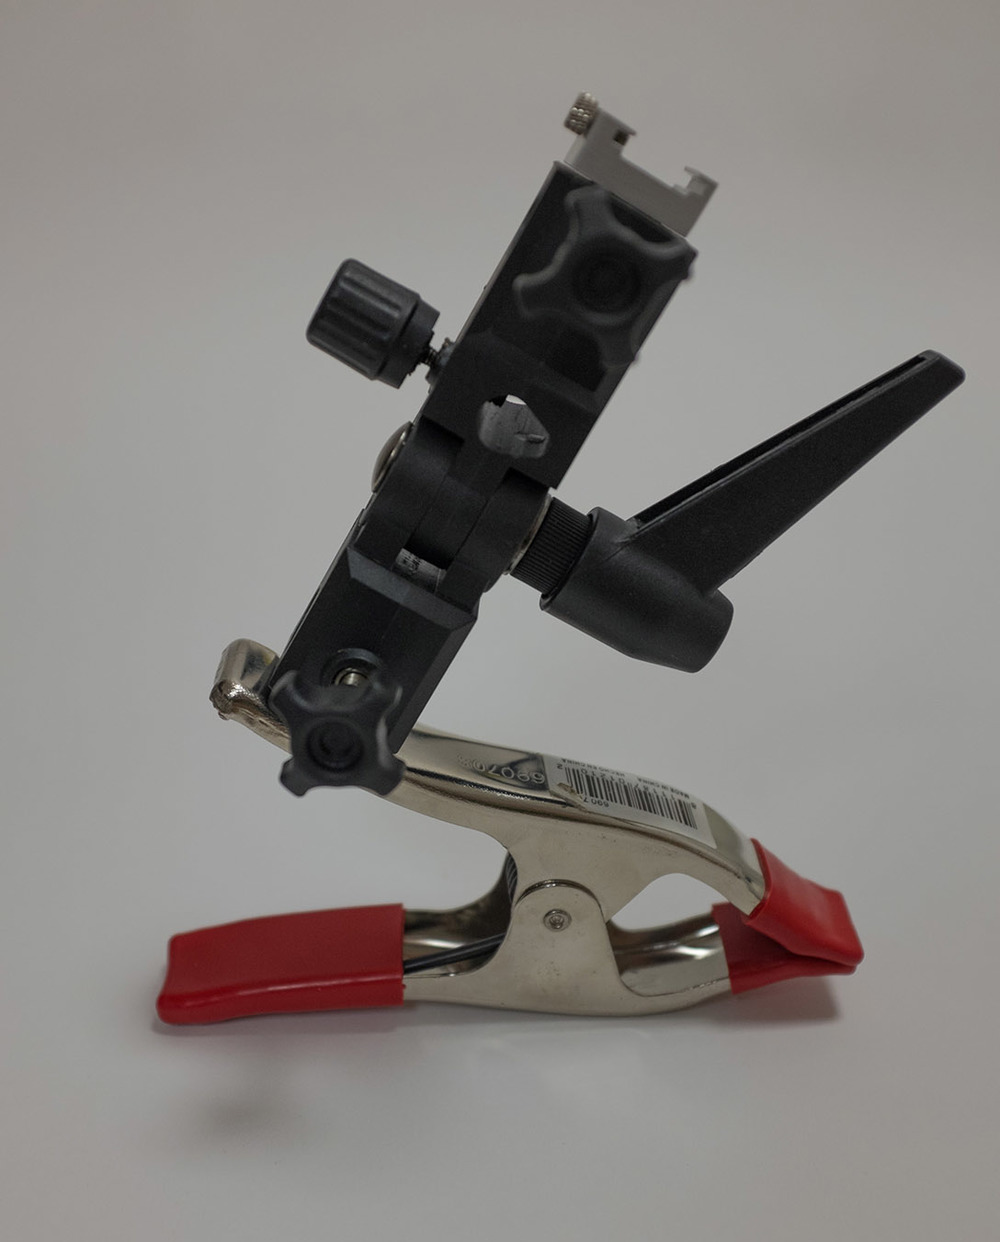 clamp009.jpg